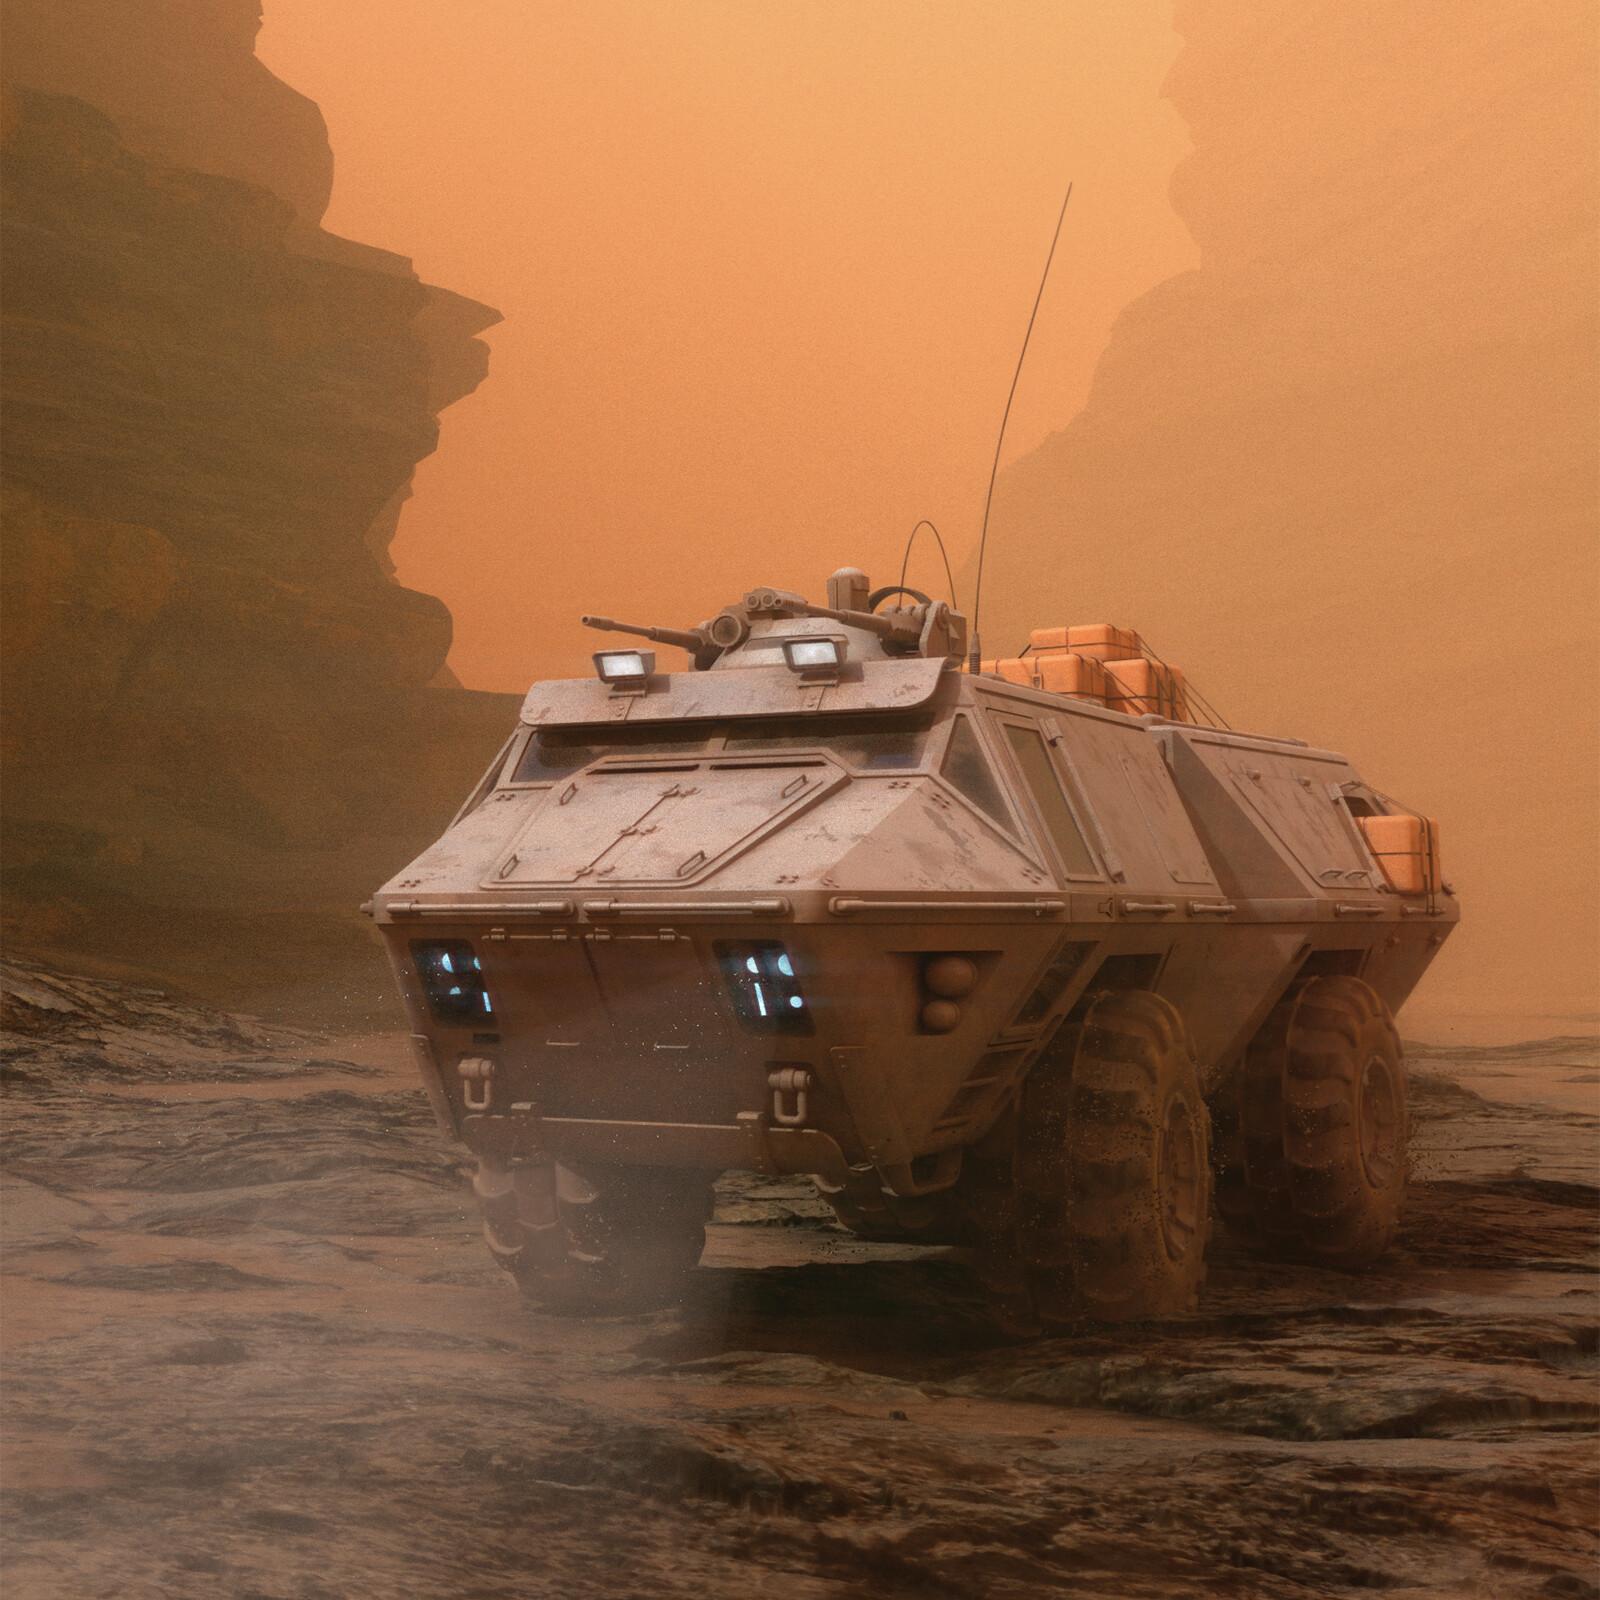 Mars Rover close-up